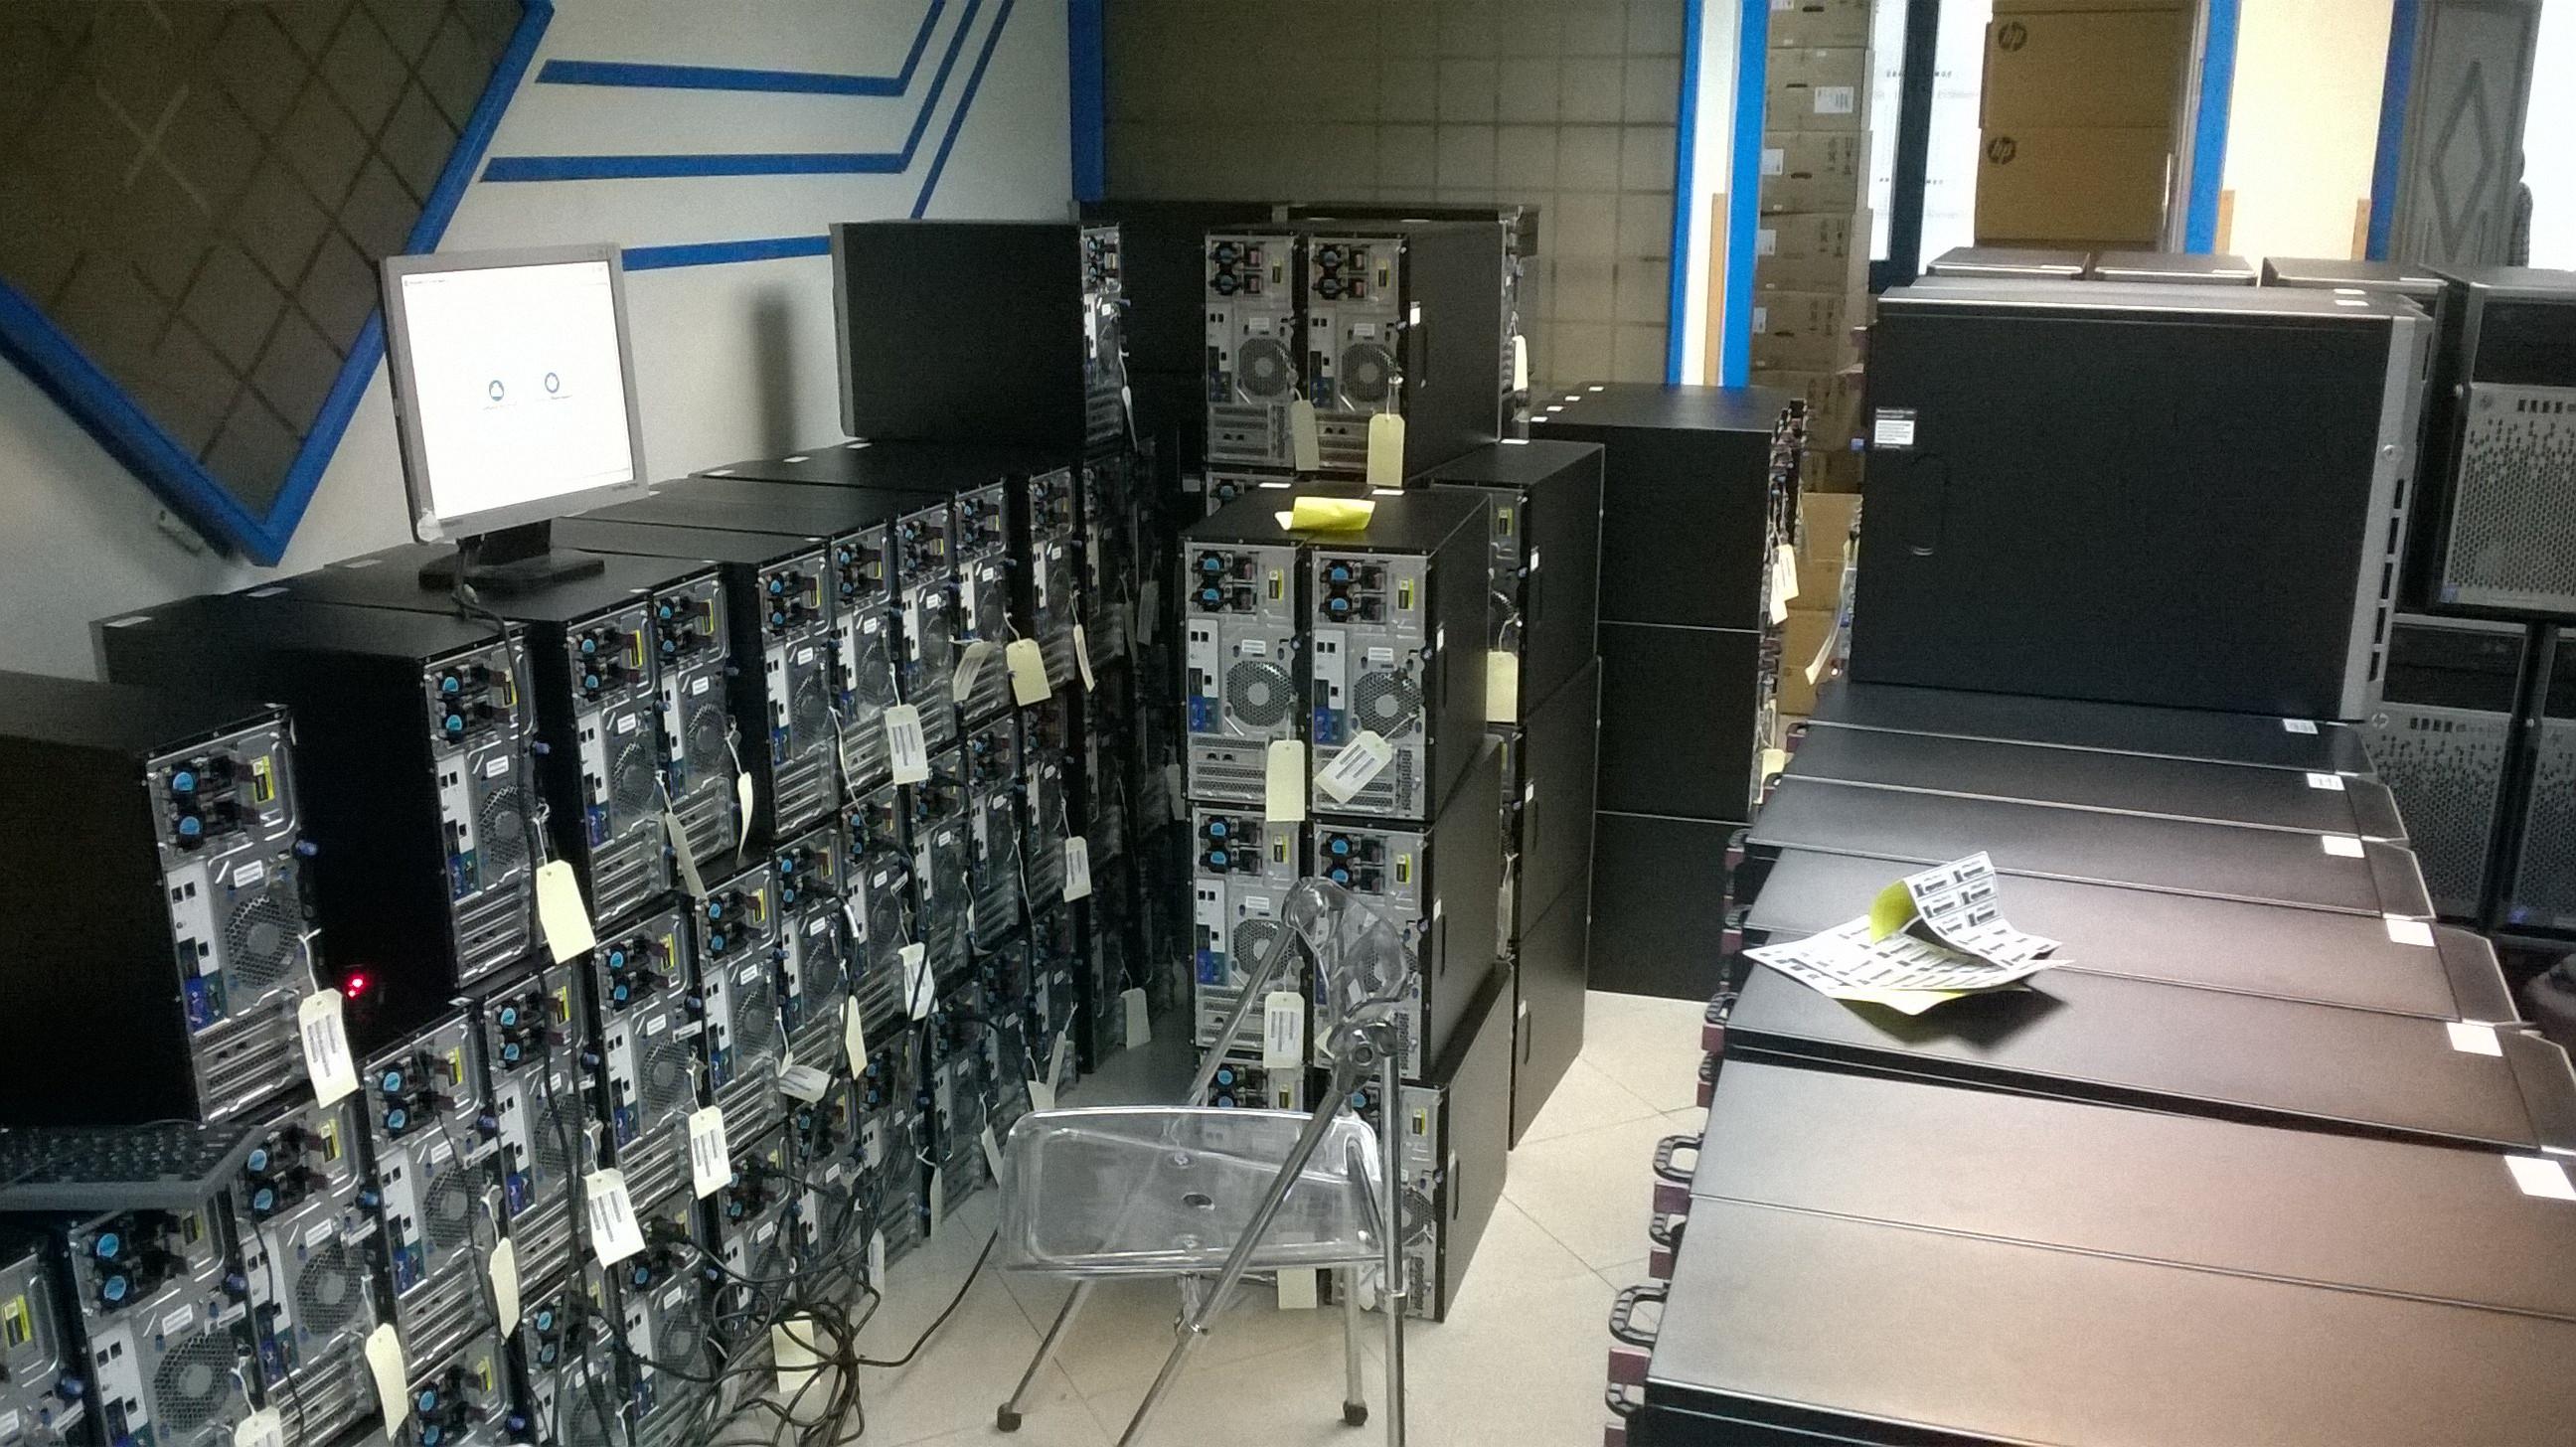 ll support , sonicwall firewall , sonicwall tz200  , my sonicwall , firewall , sonicwall nsa 4600, sonicwall 4500, sonicwall nsa 3500  , sonicwall nsa 3600 , sonicwall nsa 2400, sonicwall nsa 5500 , sonicwall nsa 6500,  sonicwall nsa 6600, firewall hardware , DL380P G8 , سرور جی هشت ,  سرور اچ پی سری جی هشت , سرور اچ پی , سرور G8 , فروش سرور اچ پی G8 , سوئیچ سیسکو مدل ۳۵۶۰ , سوئیچ سیسکو مدل ۳۷۵۰و ۳۷۵۰-X ,  سوئیچ سیسکو مدل ۲۹۶۰ , فروش